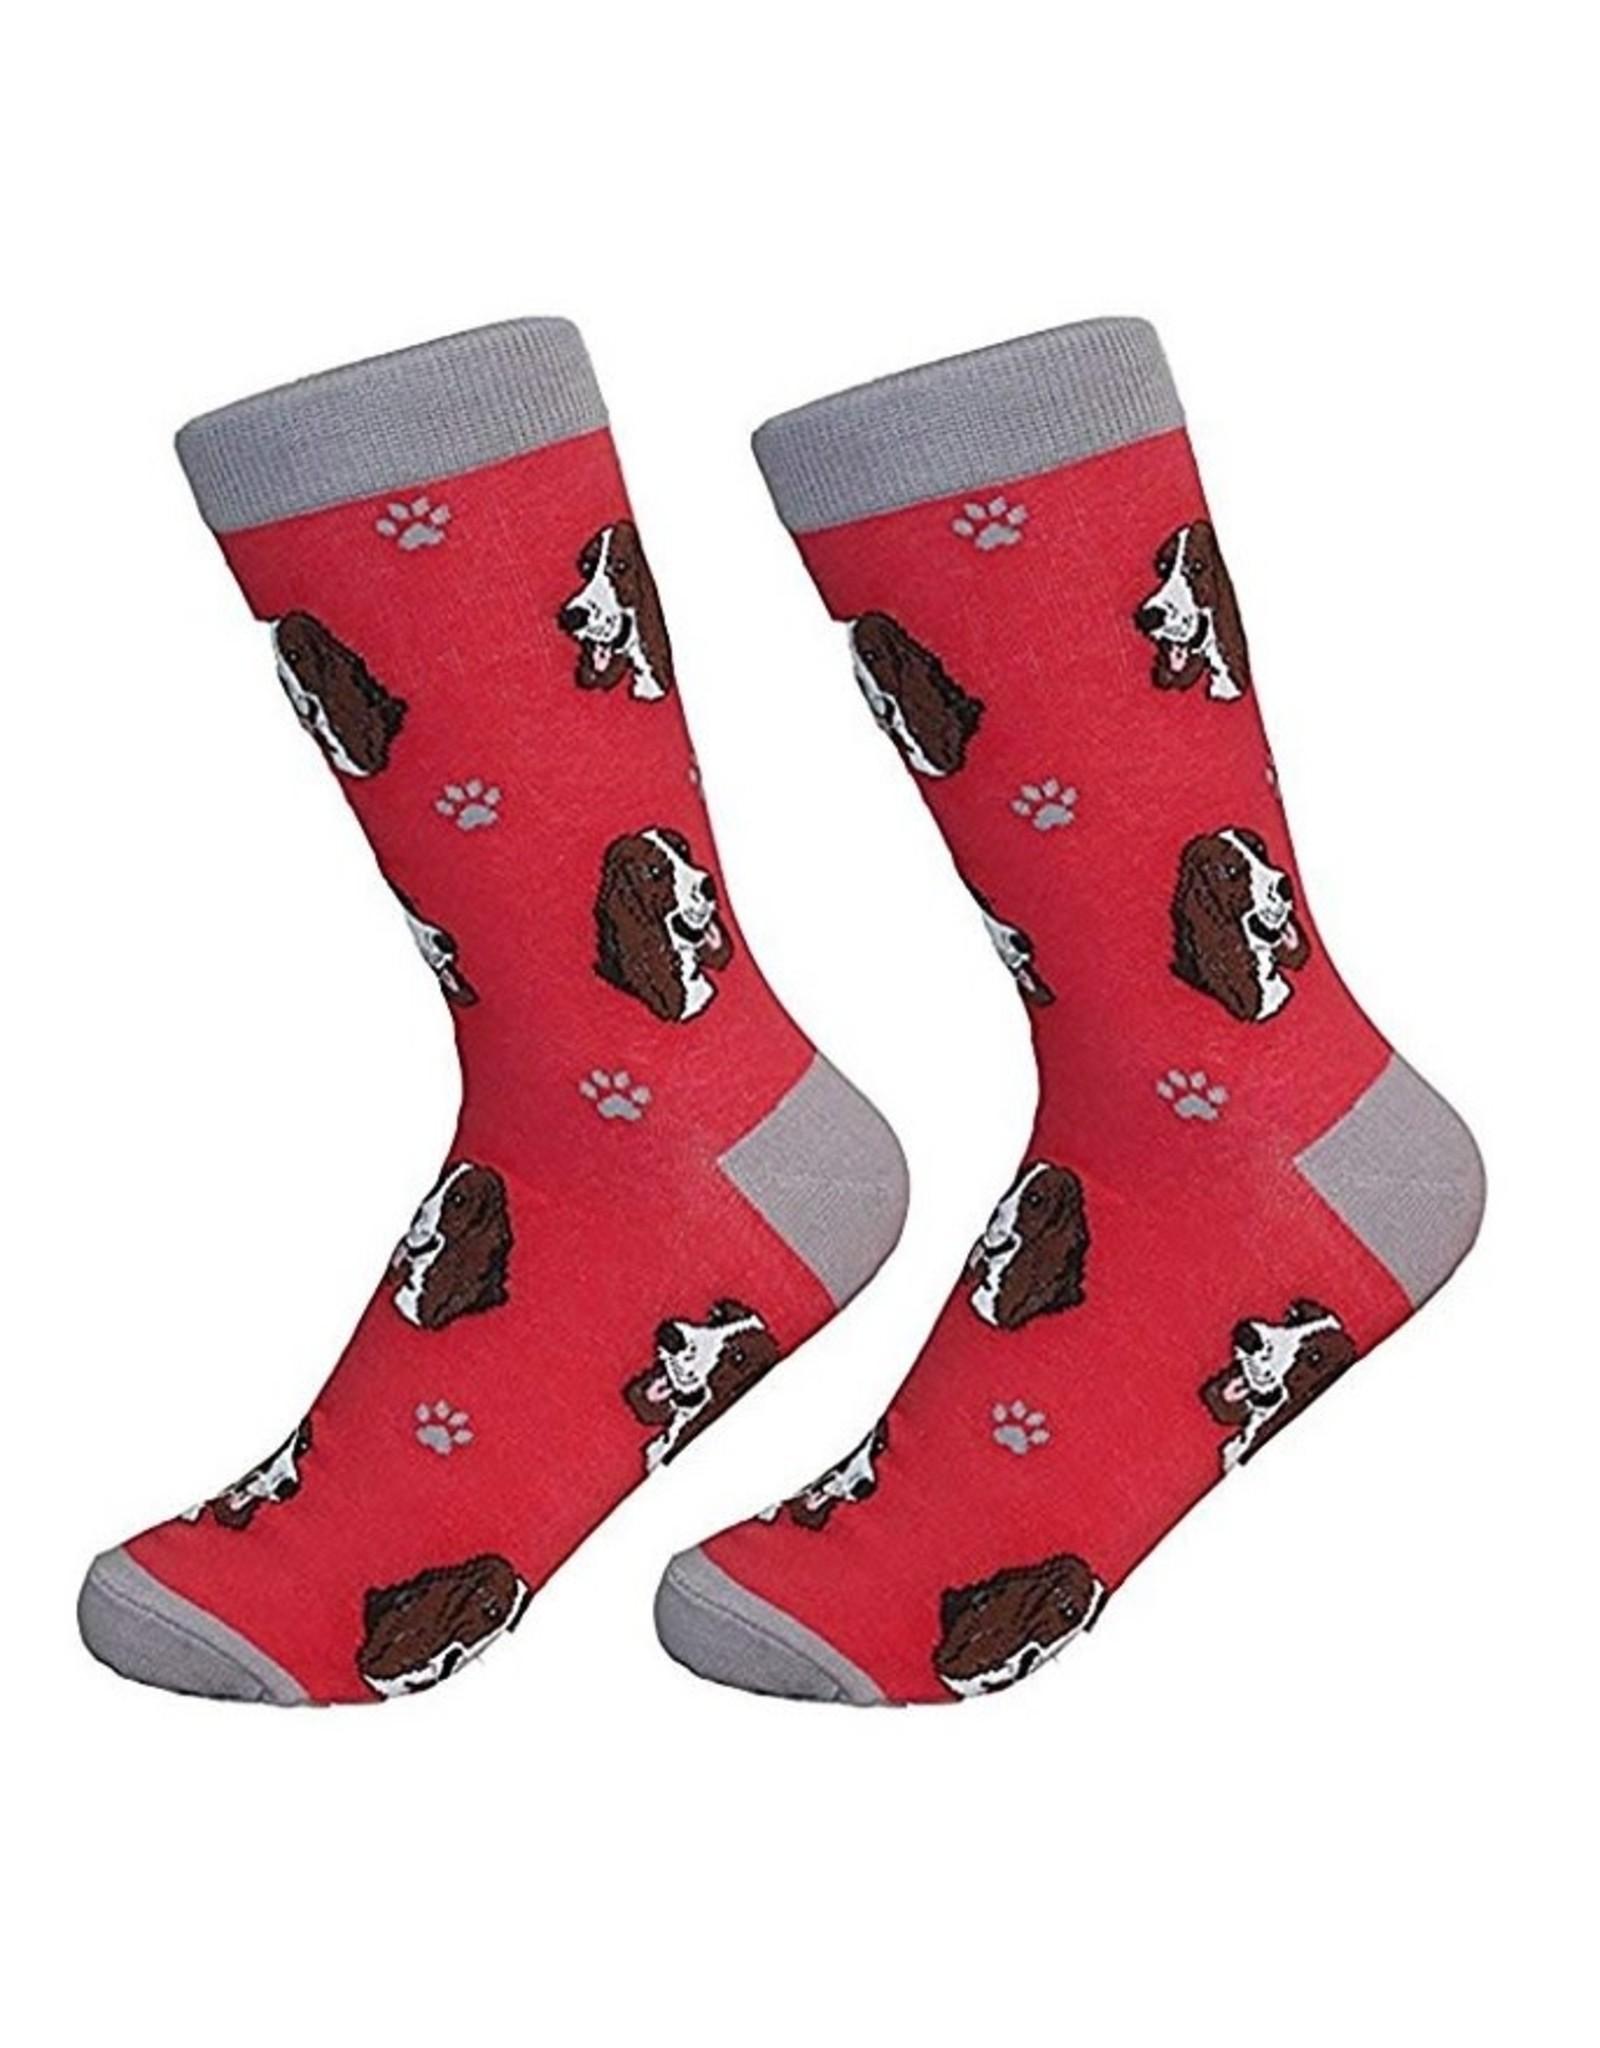 E&S Pets Basset Hound Socks